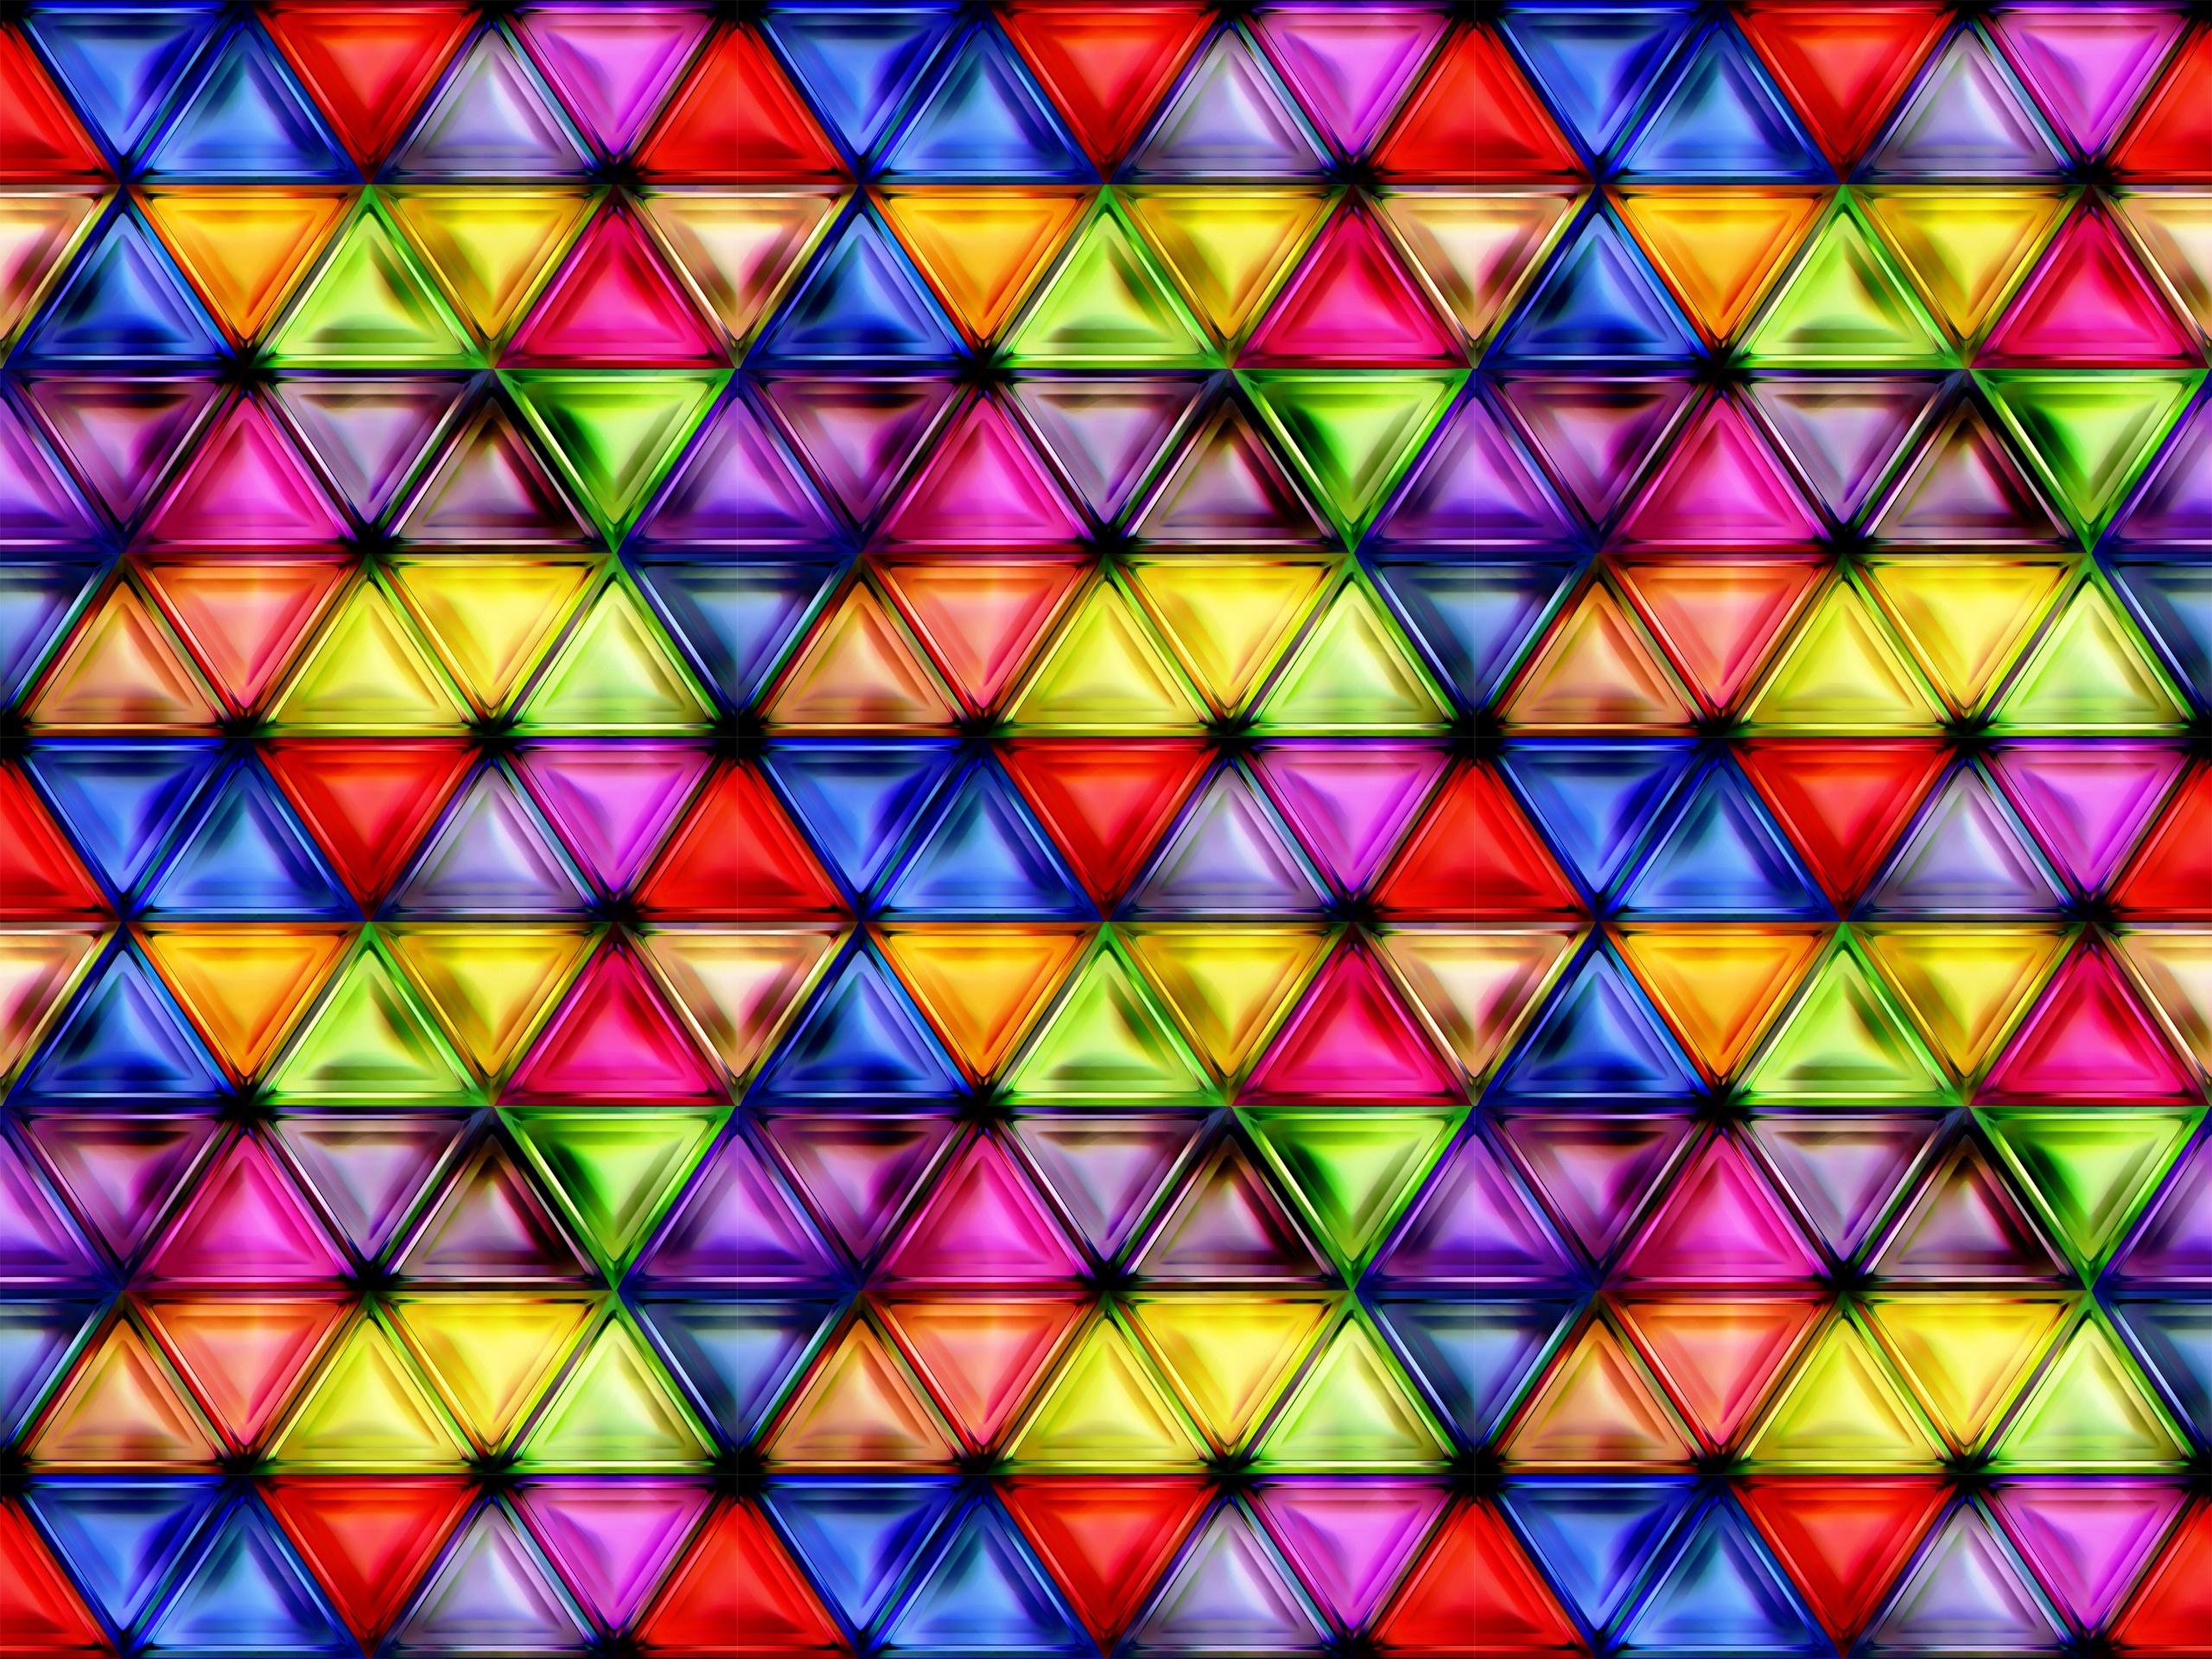 Emelyanka: текстура стекло треснутое